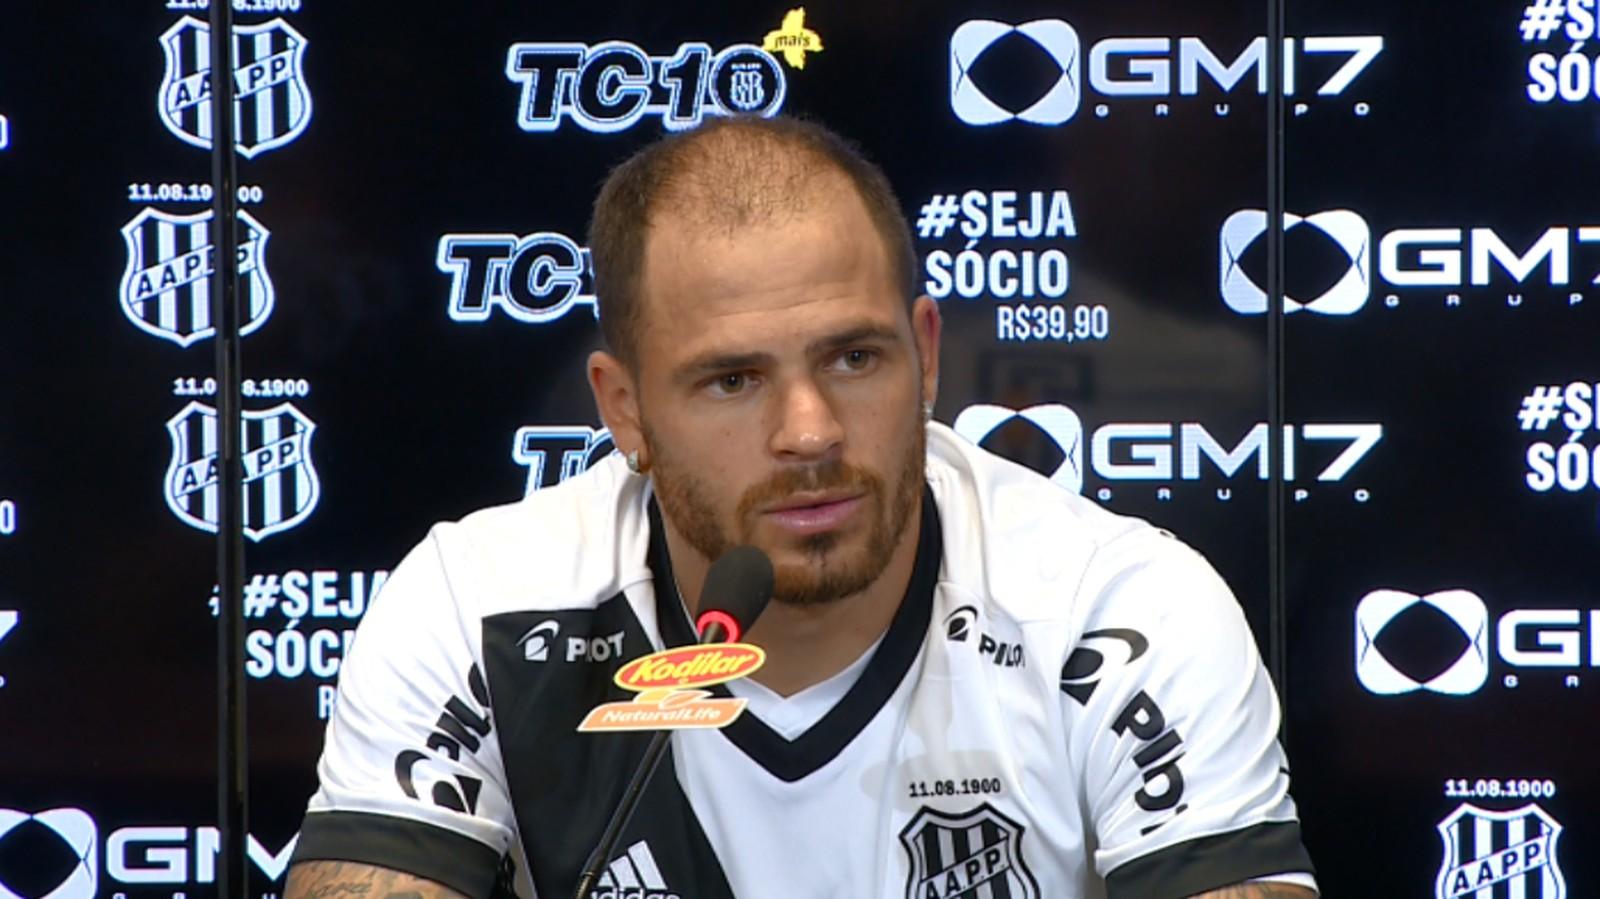 Silvinho concede entrevista no Moisés Lucarelli (Foto: Carlos Velardi / EPTV)